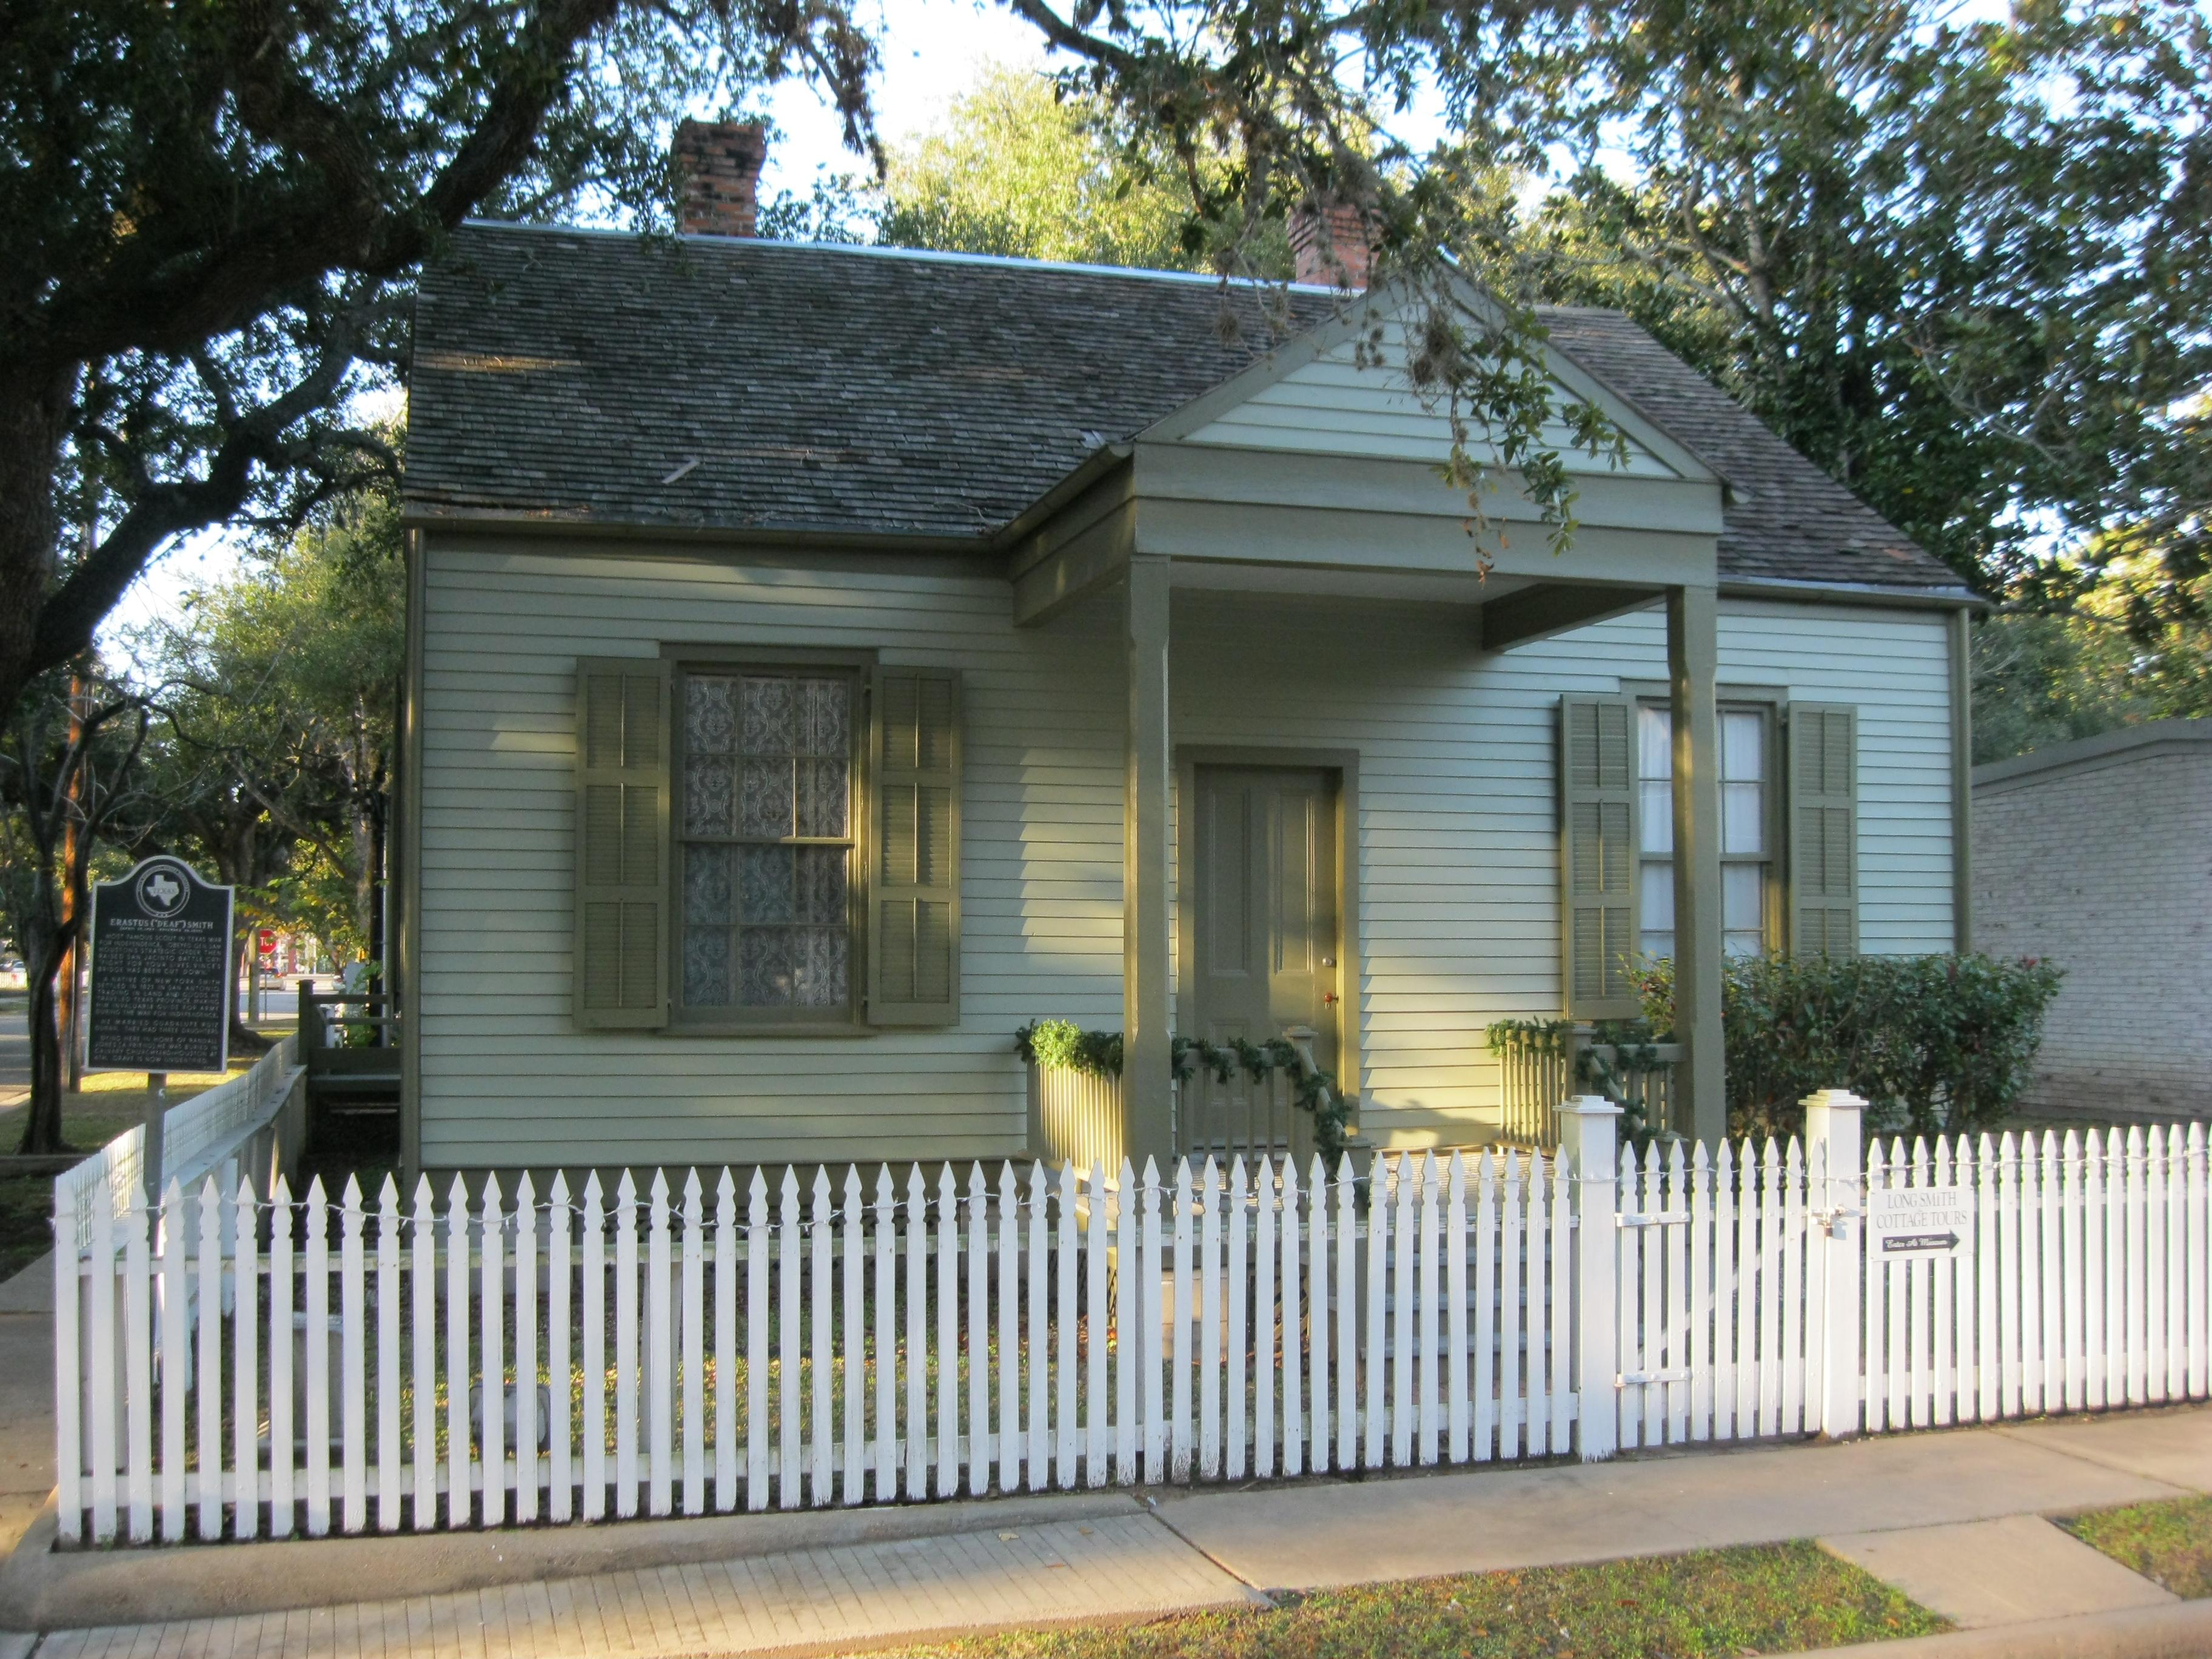 File:Richmond TX Long-Smith Cottage JPG - Wikimedia Commons